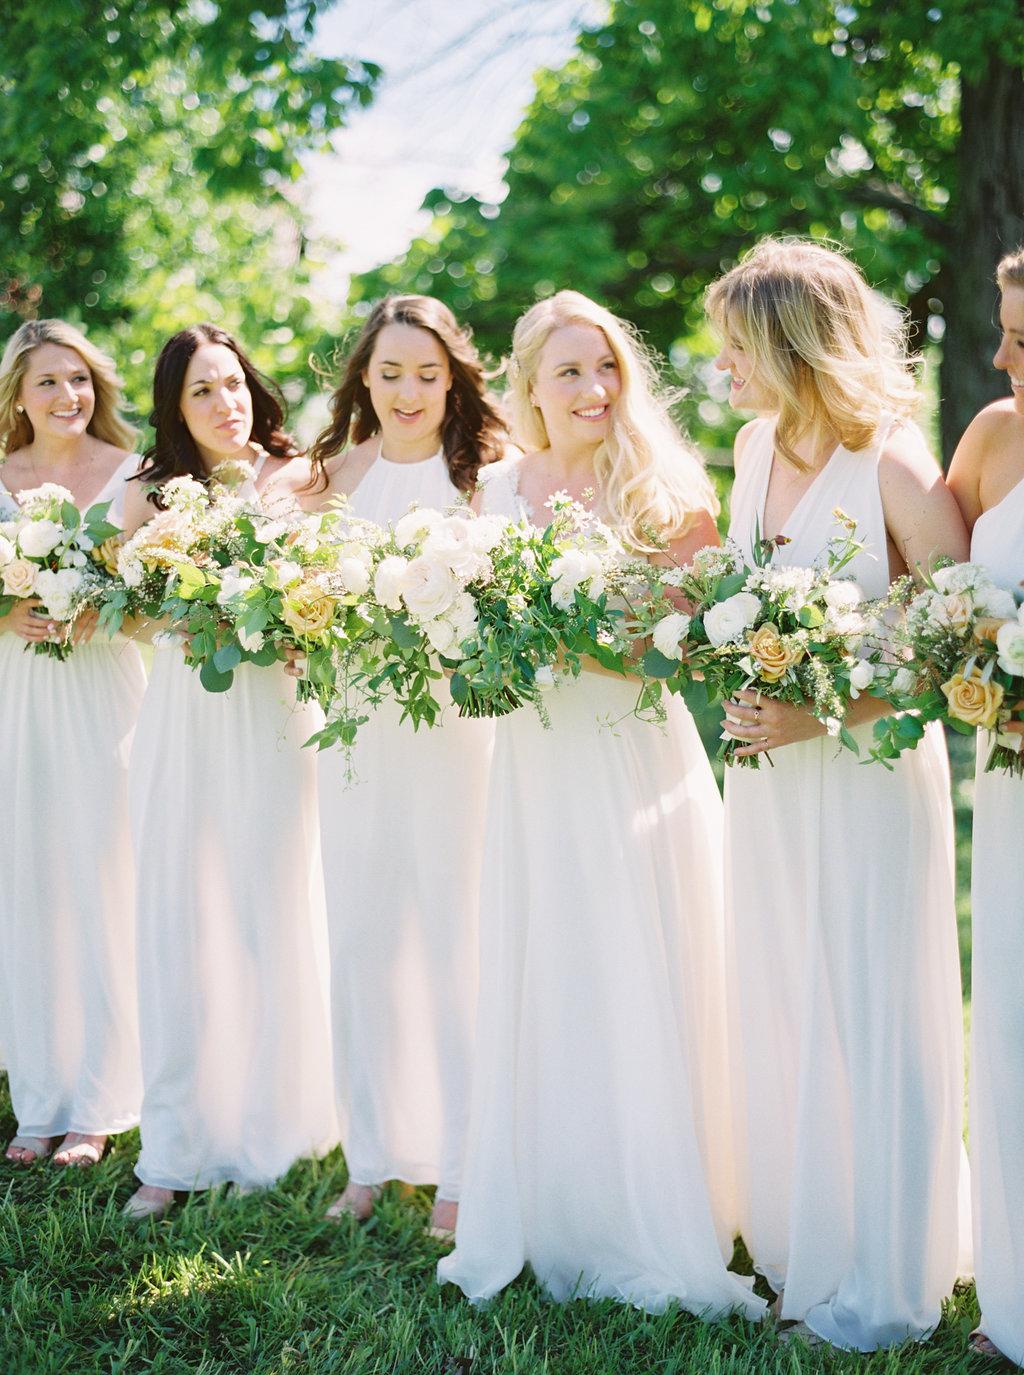 Natural barn wedding featured in   Wedding Sparrow